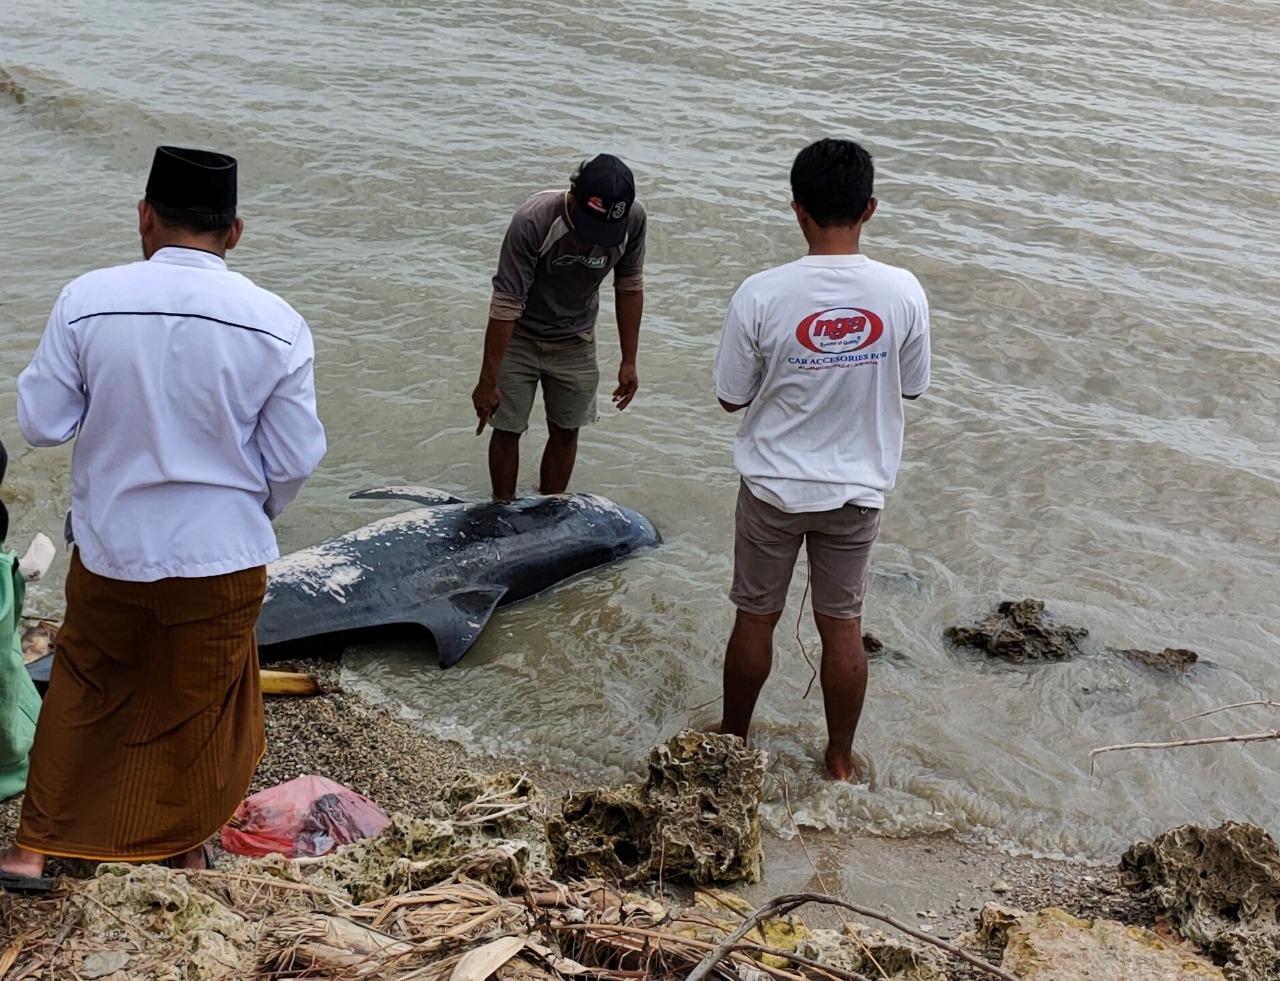 Penanganan Paus Pilot Terdampar Di Pantai Madura